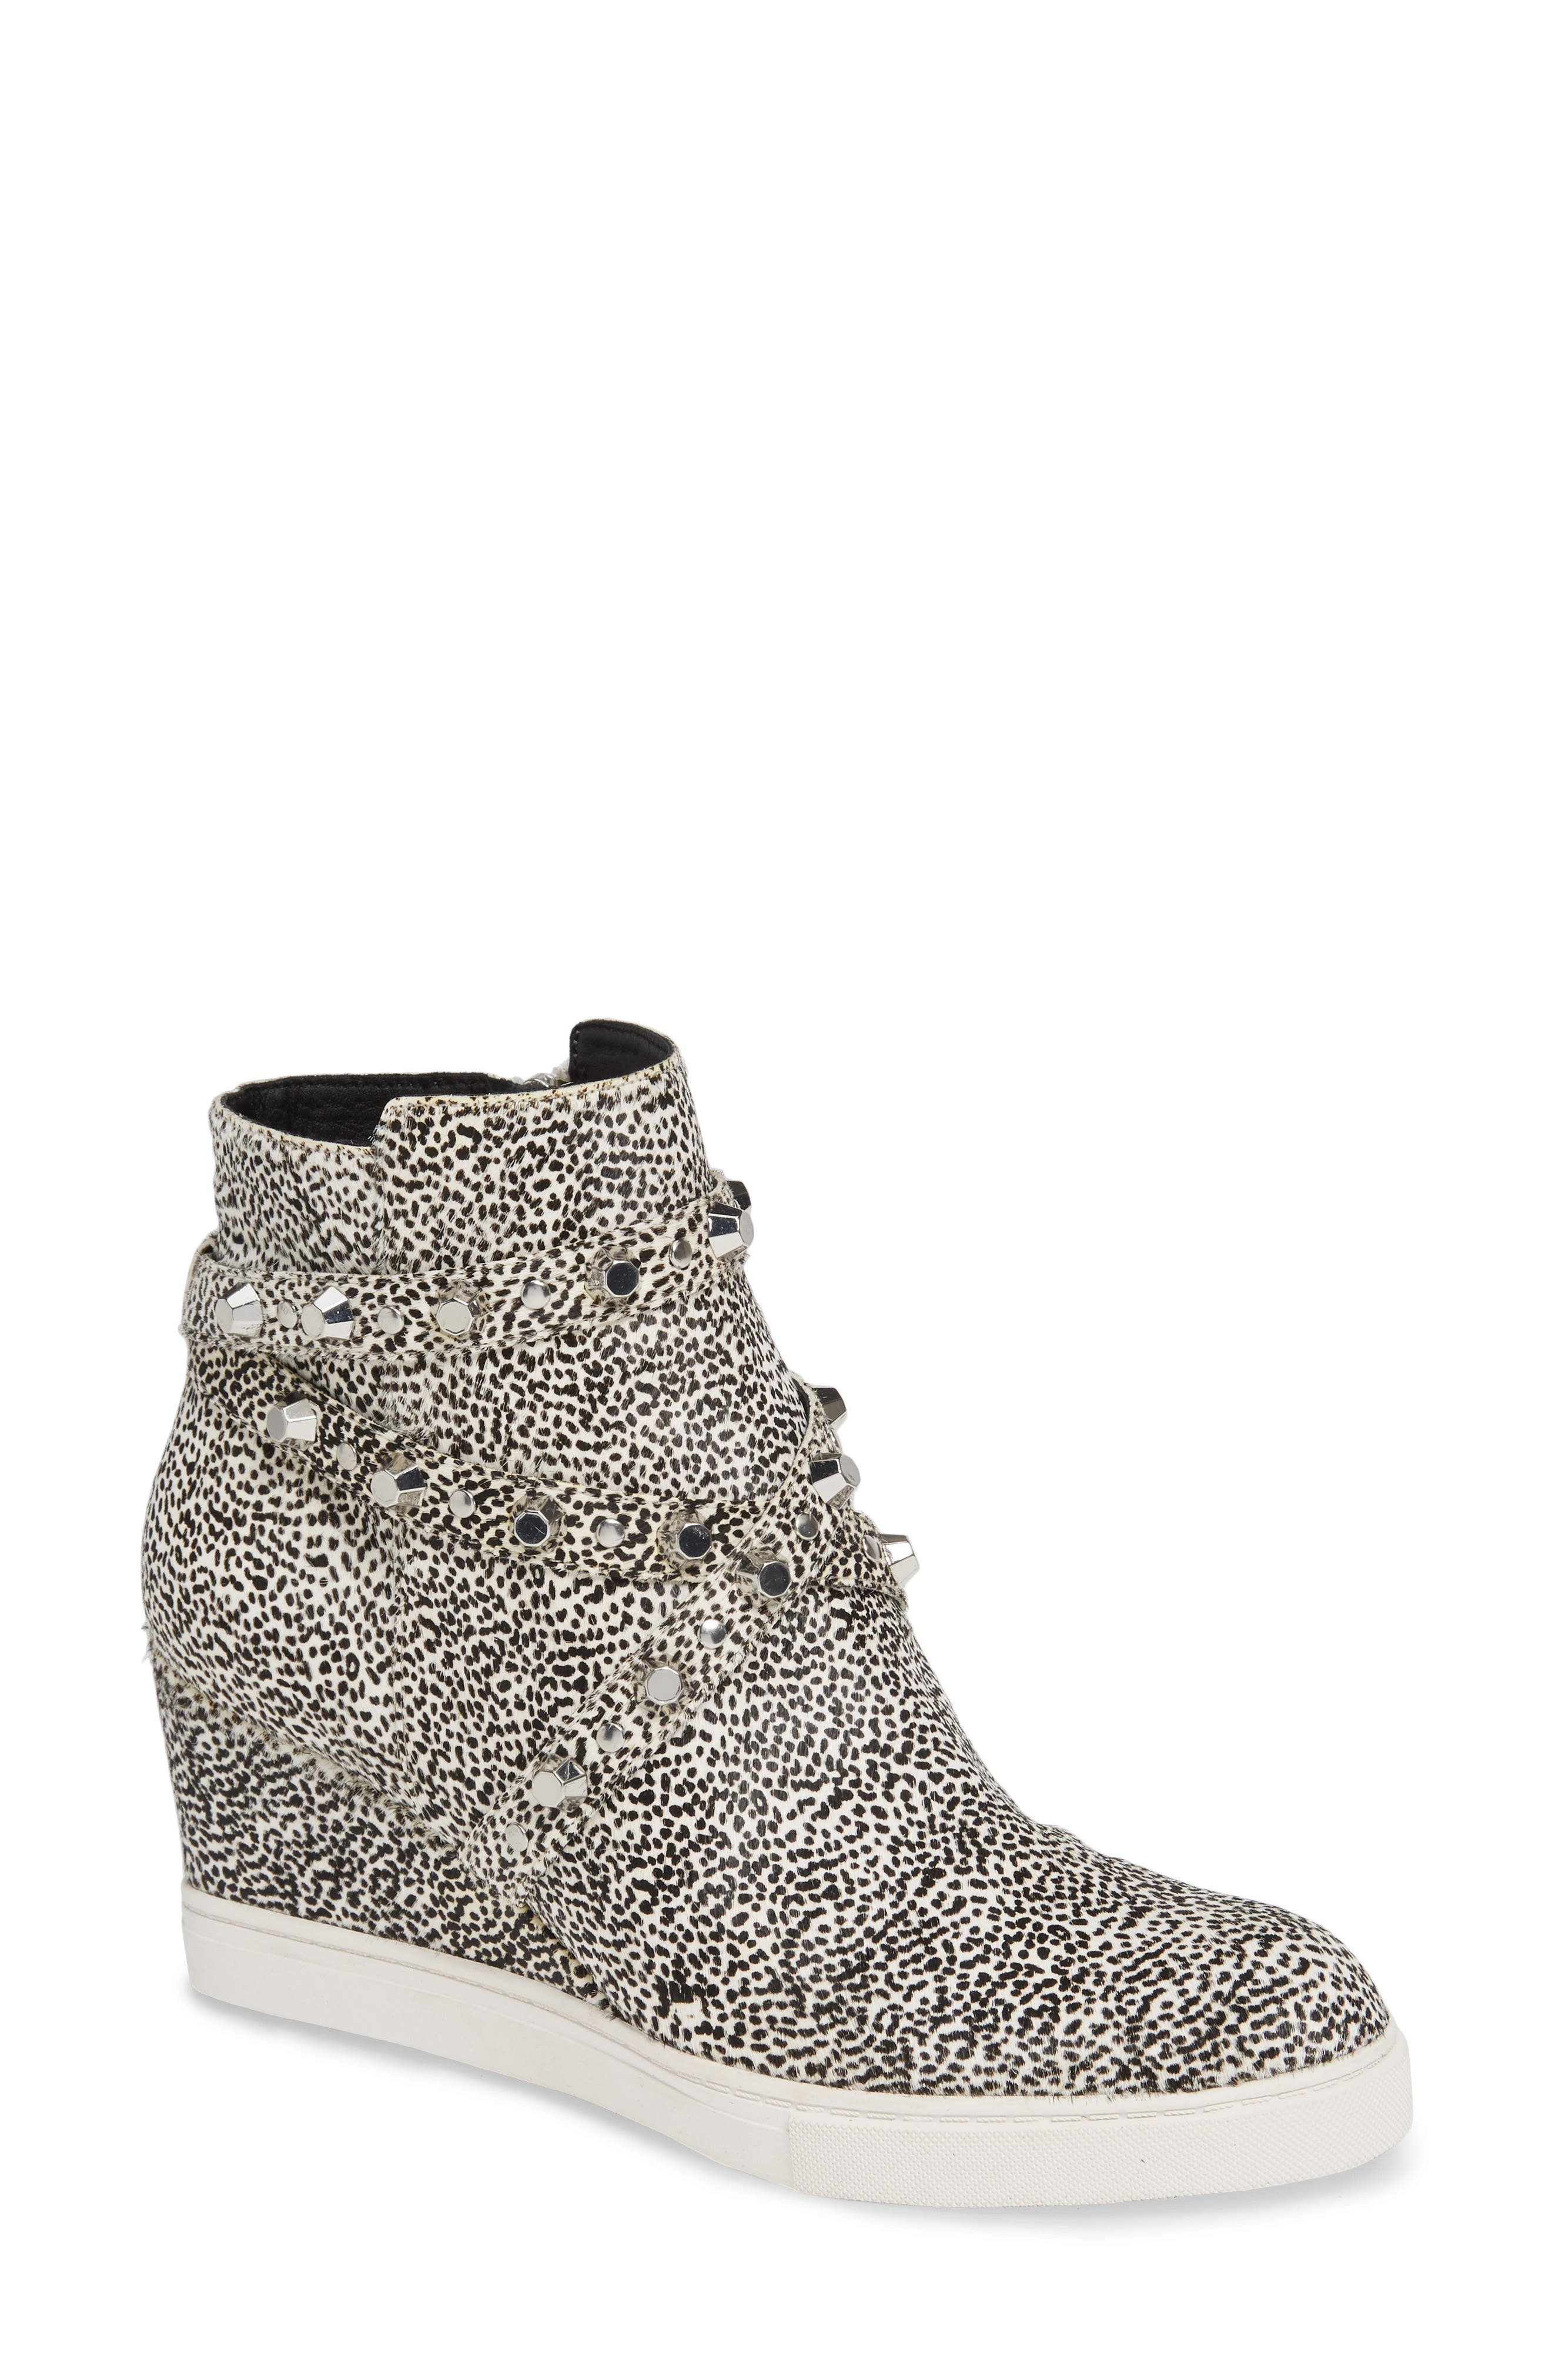 9317e95da5a Beige Wedge Sneakers for Women